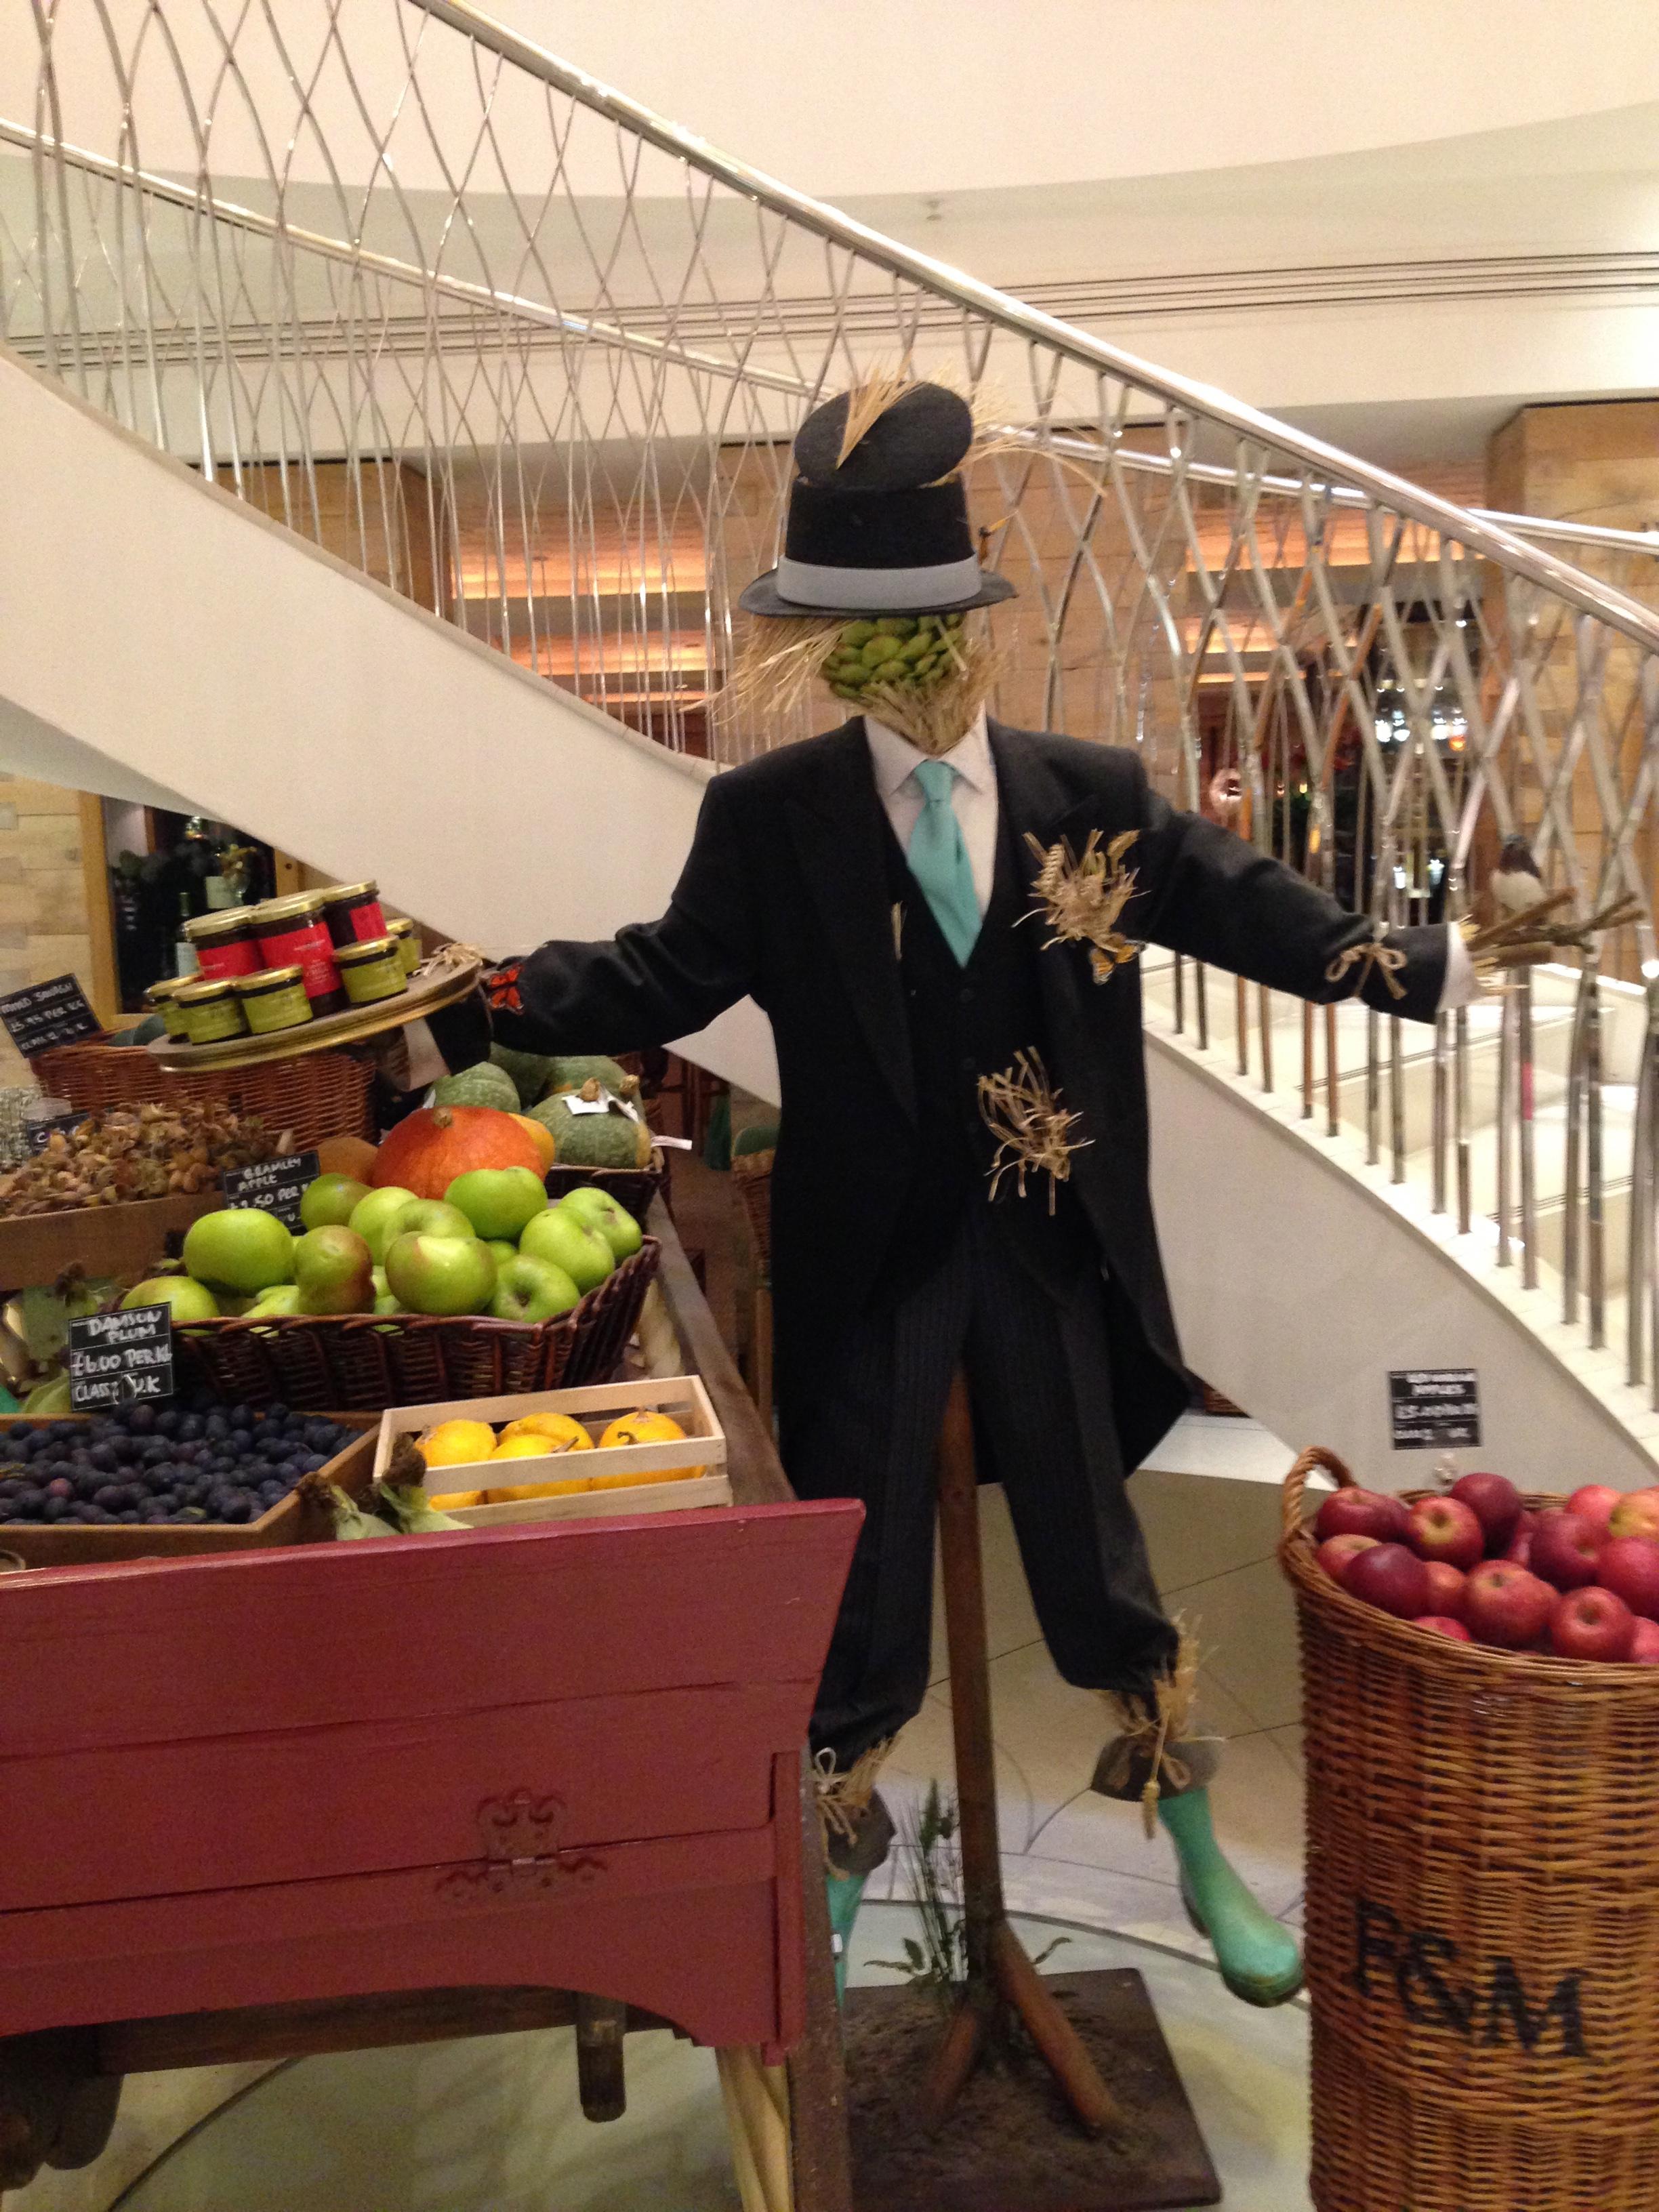 Halloween at fortnum mason 2015 nila holden - Fortnum and mason christmas decorations ...